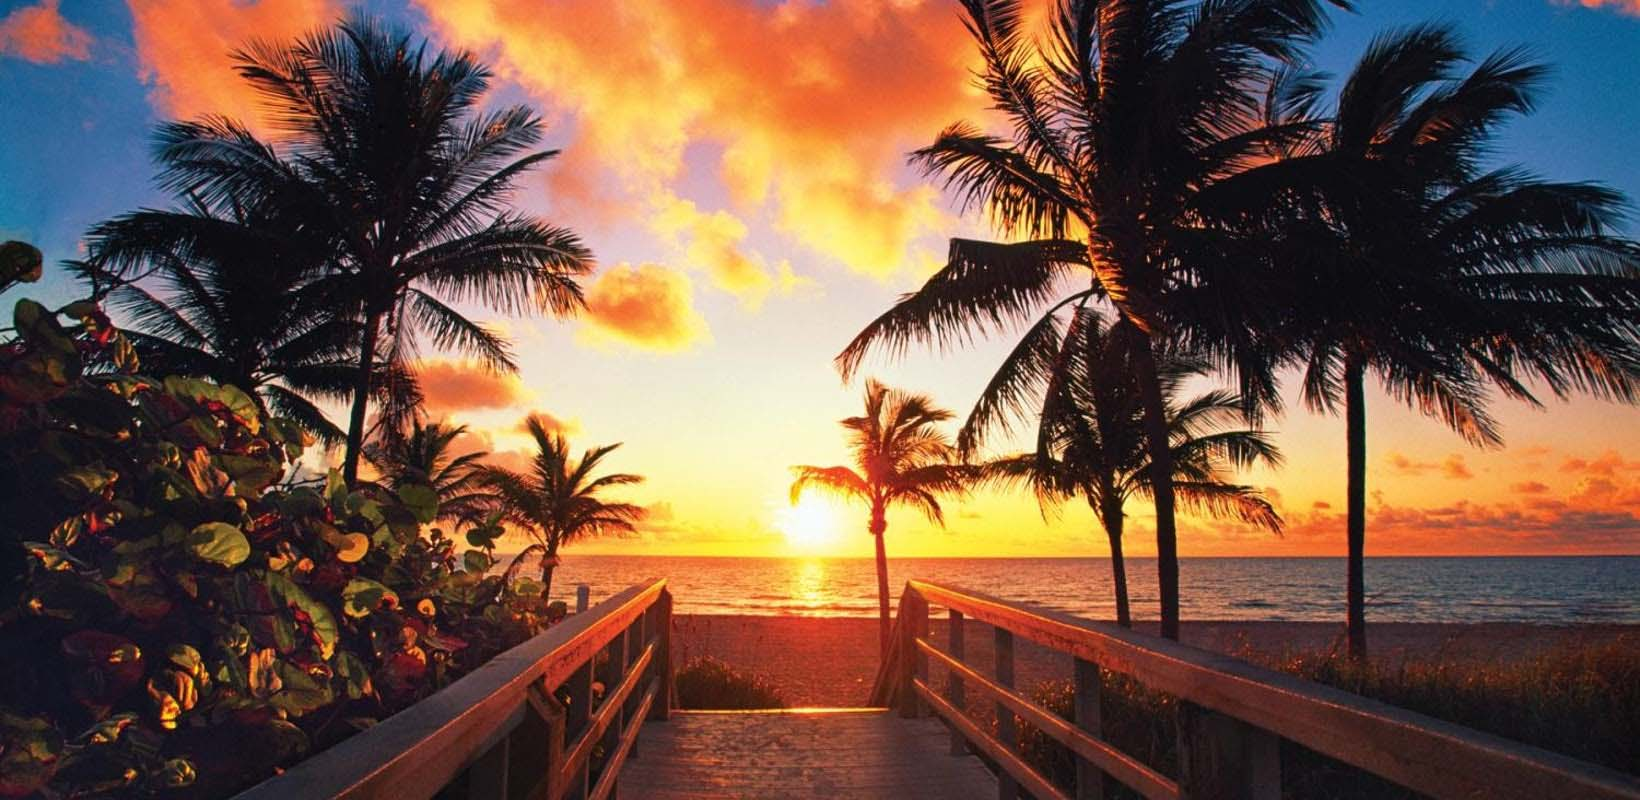 Key West day trip with Conch Train tour